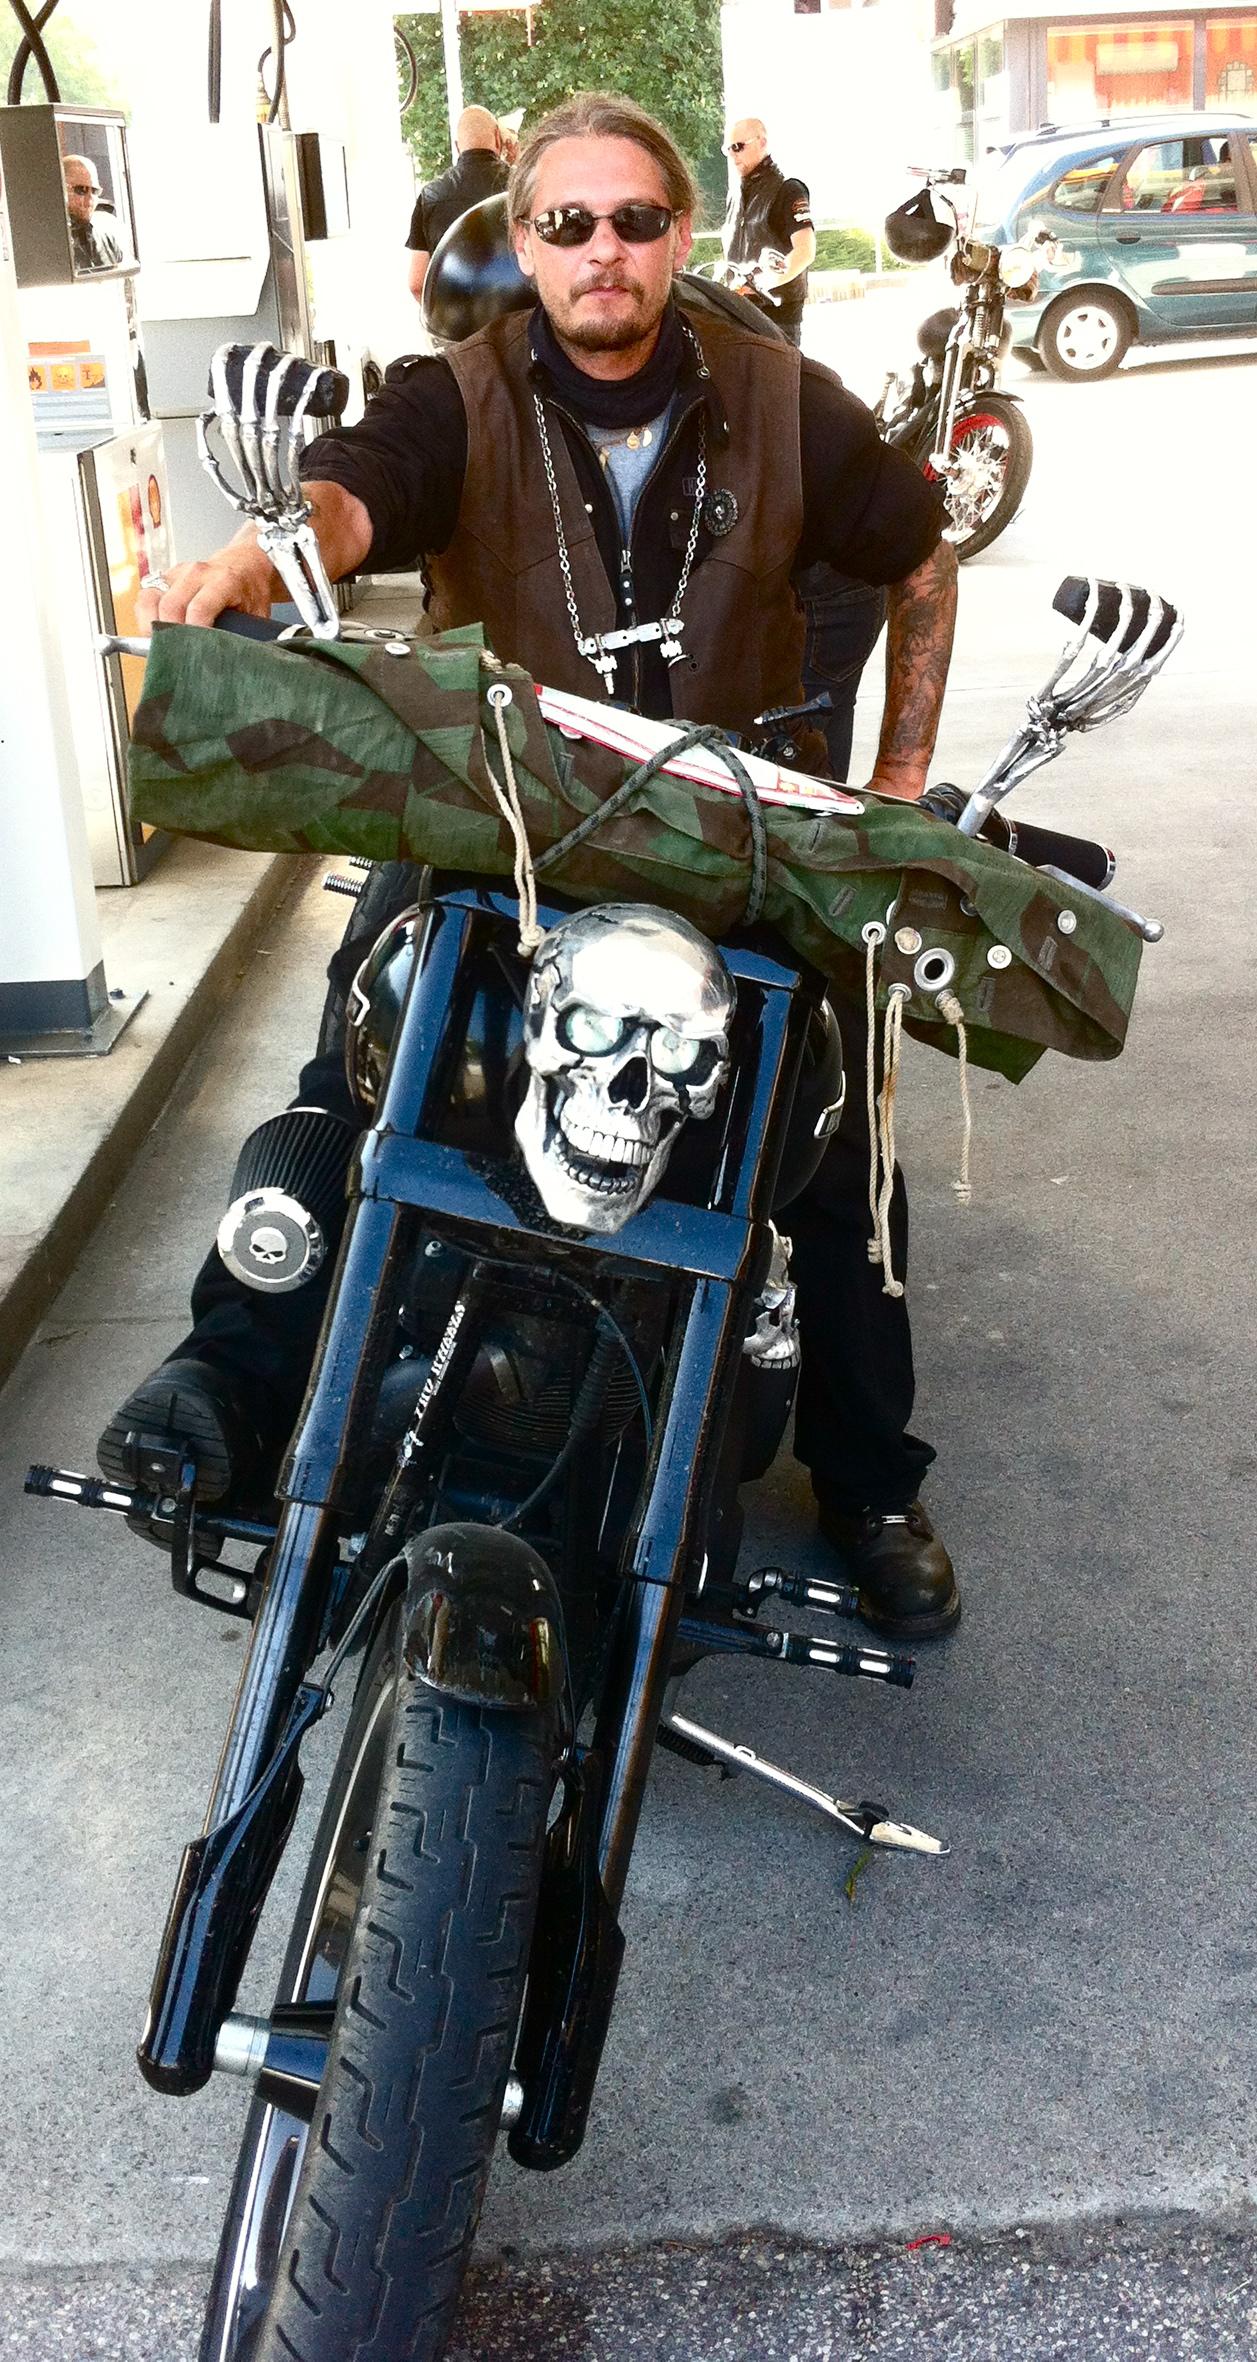 Fribourg biker